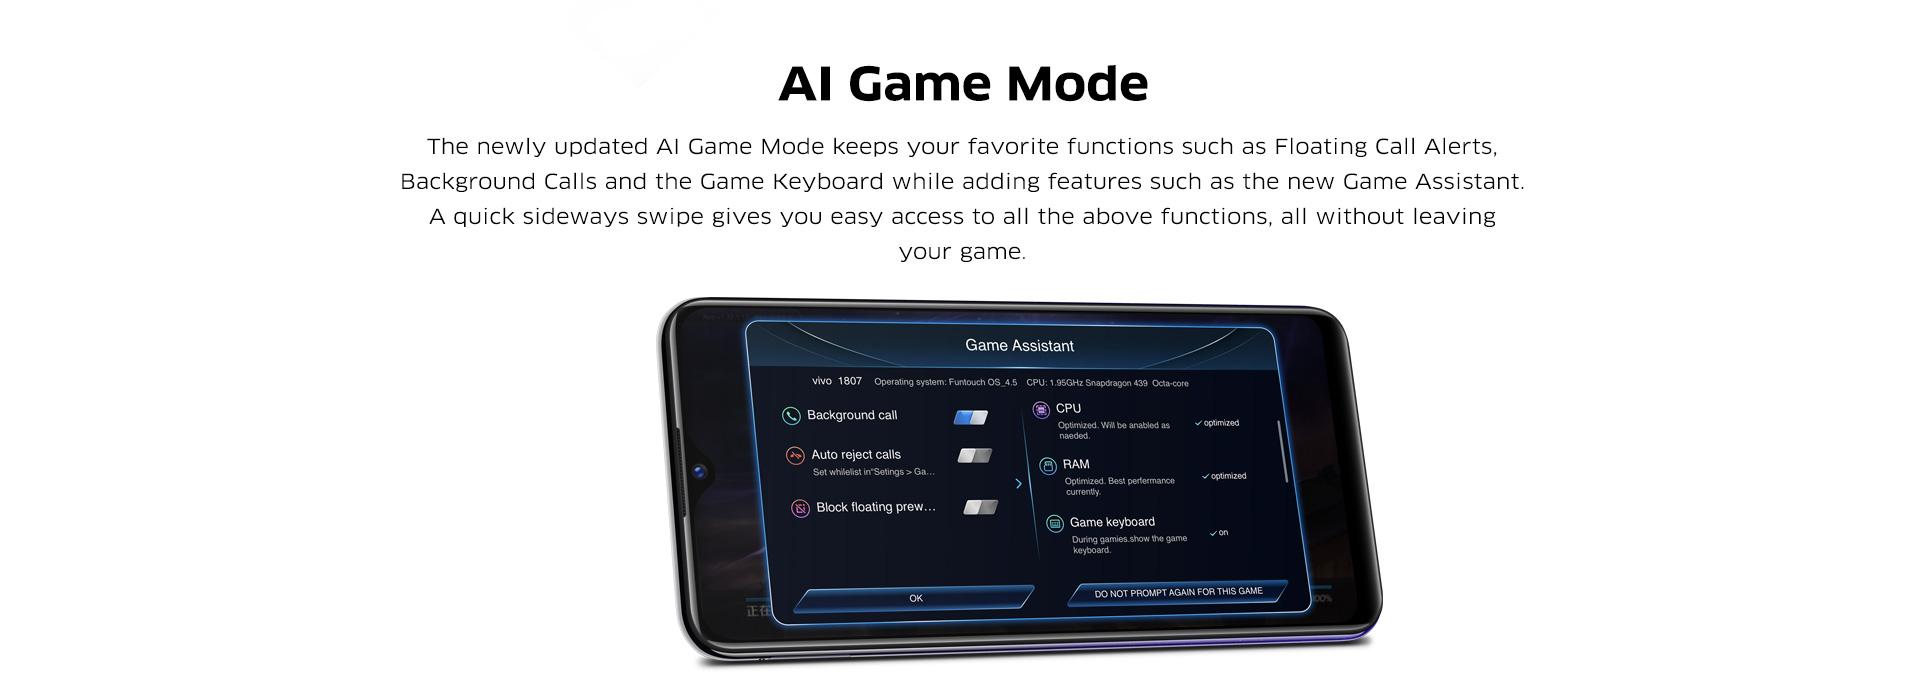 Vivo Best Gaming Mobile Phone 2018